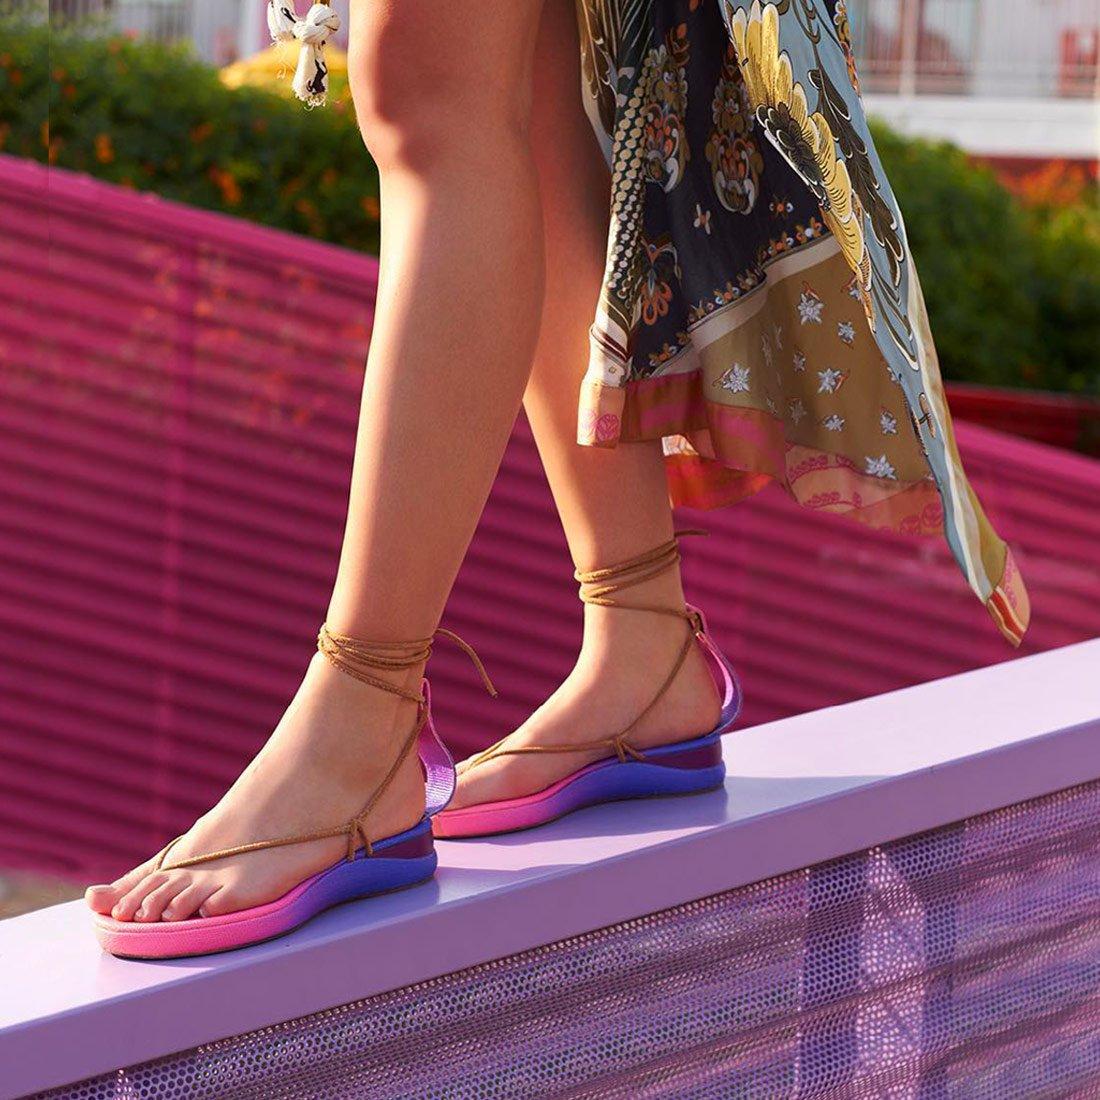 Актуально сейчас: сандалии